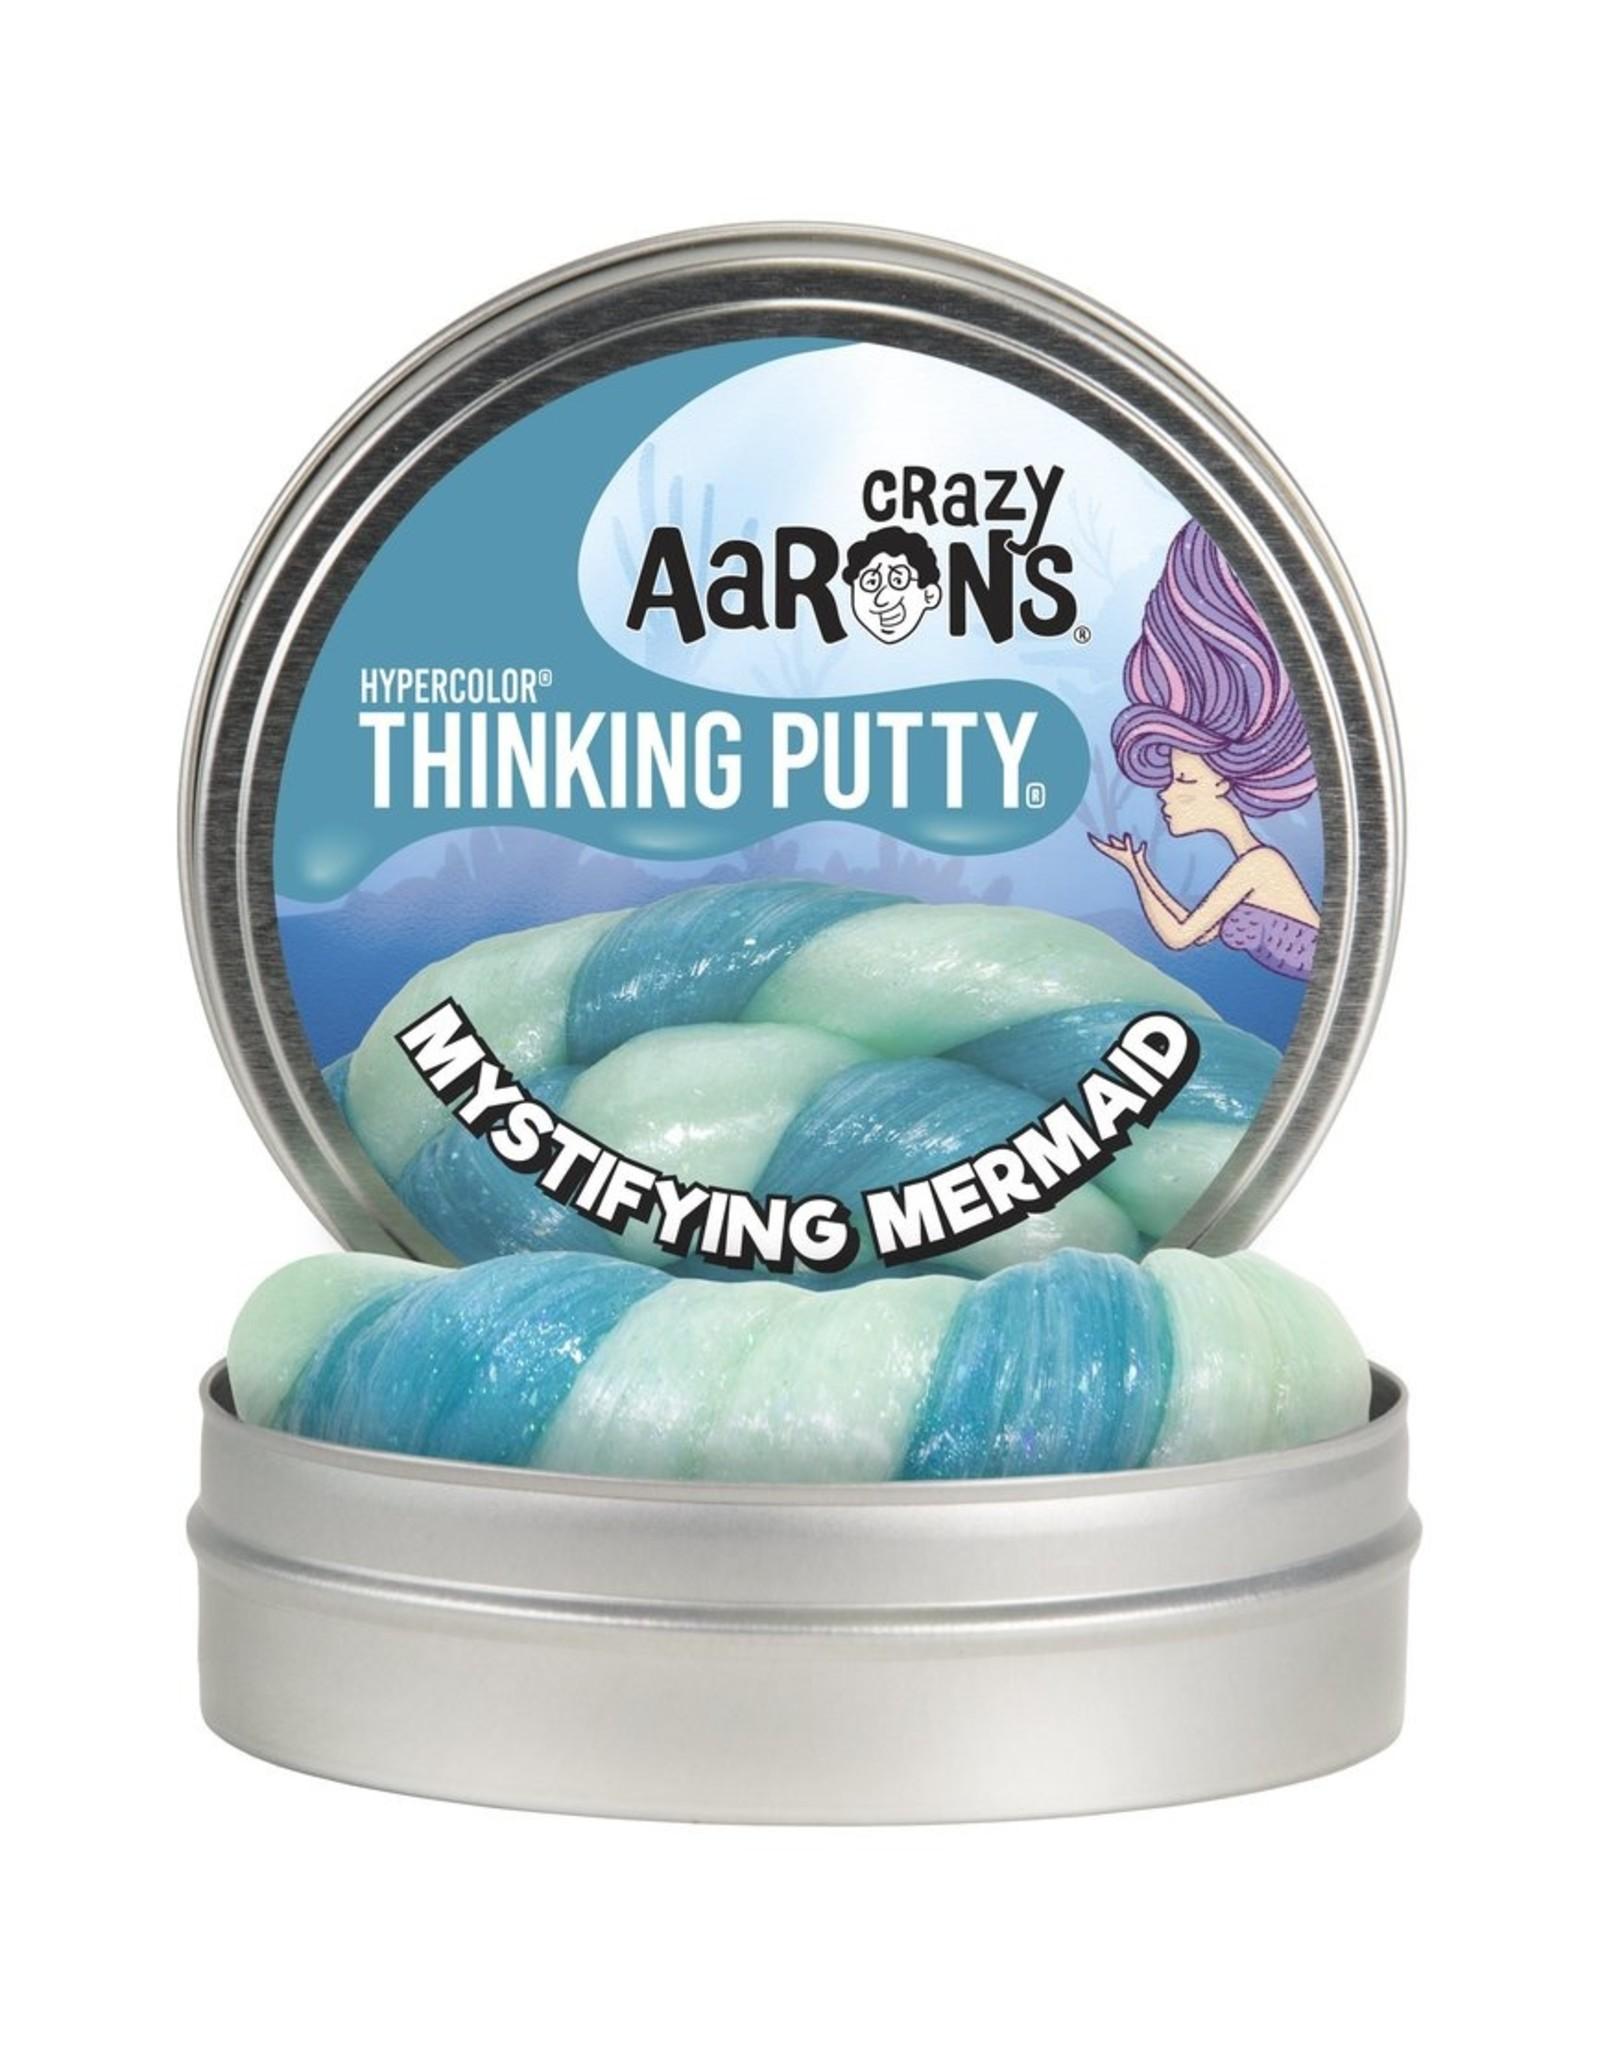 Crazy Aarons 3.2 oz - Mystifying Mermaid Thinking Putty